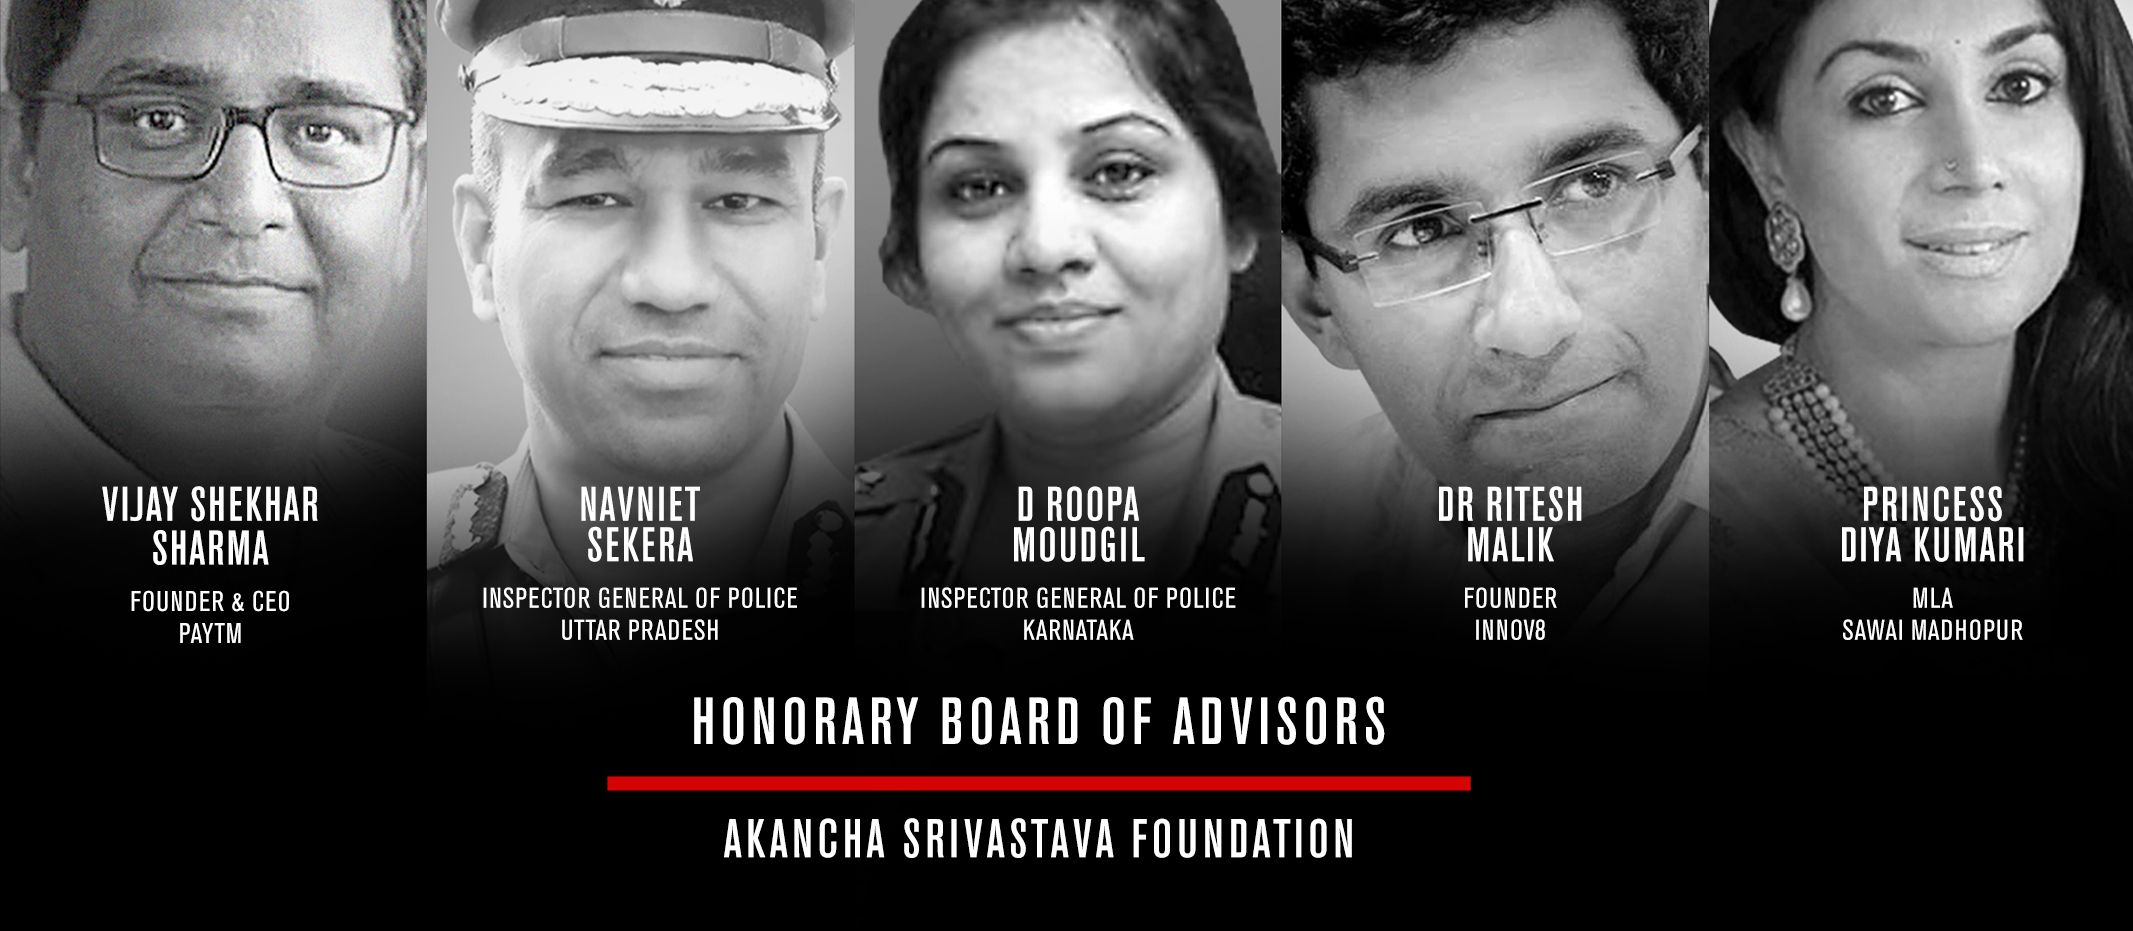 HONORARY BOARD OF ADVISORS #AAH